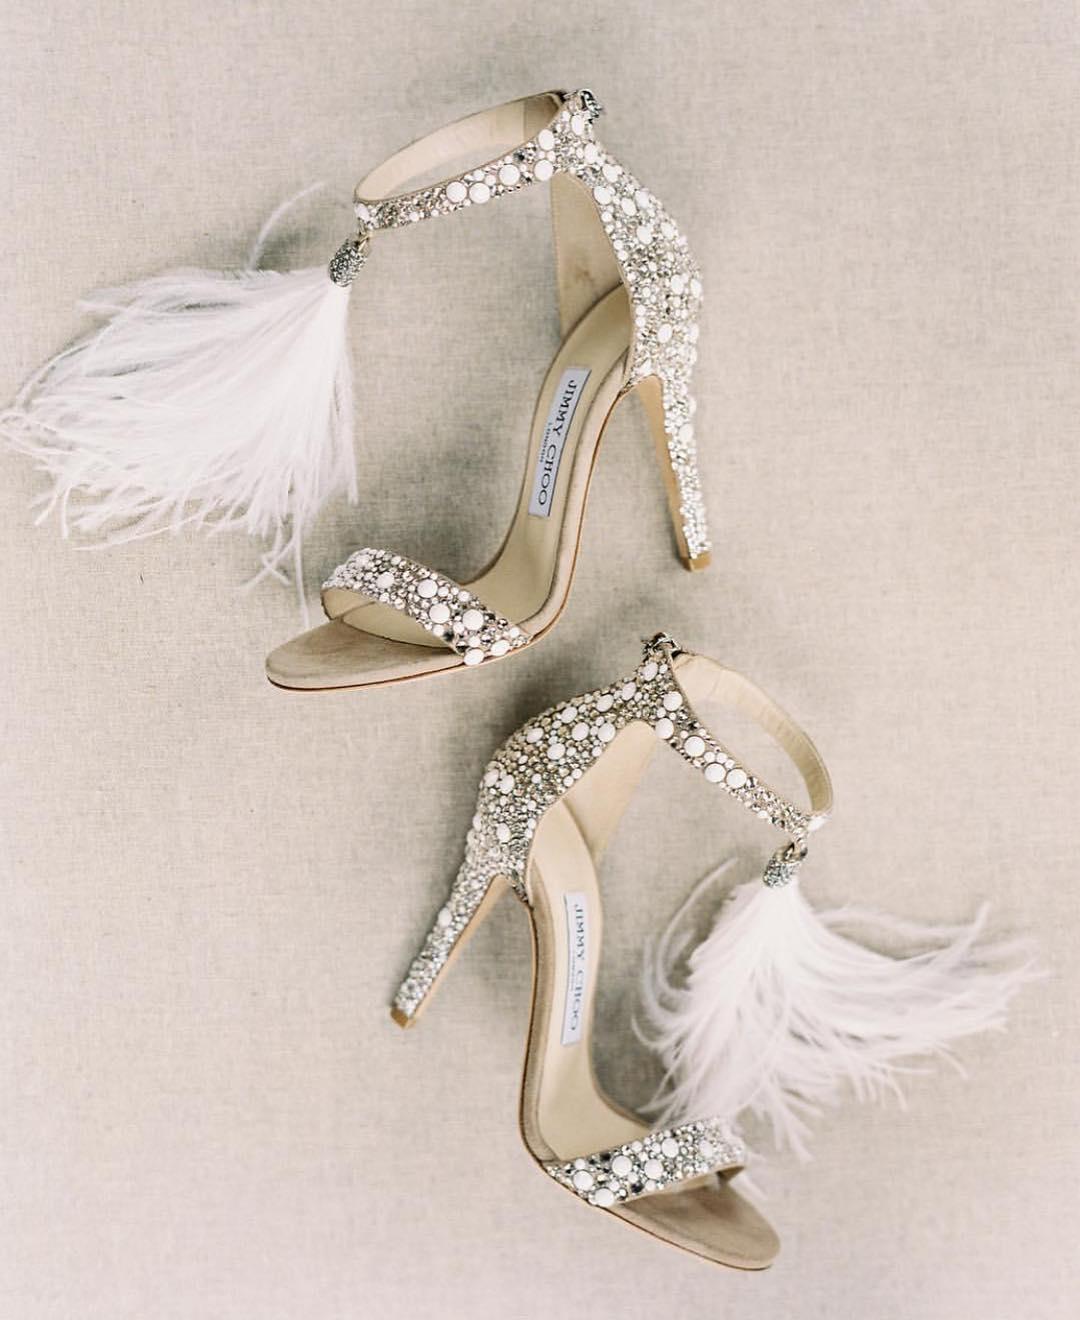 Bridal Heel with Fur